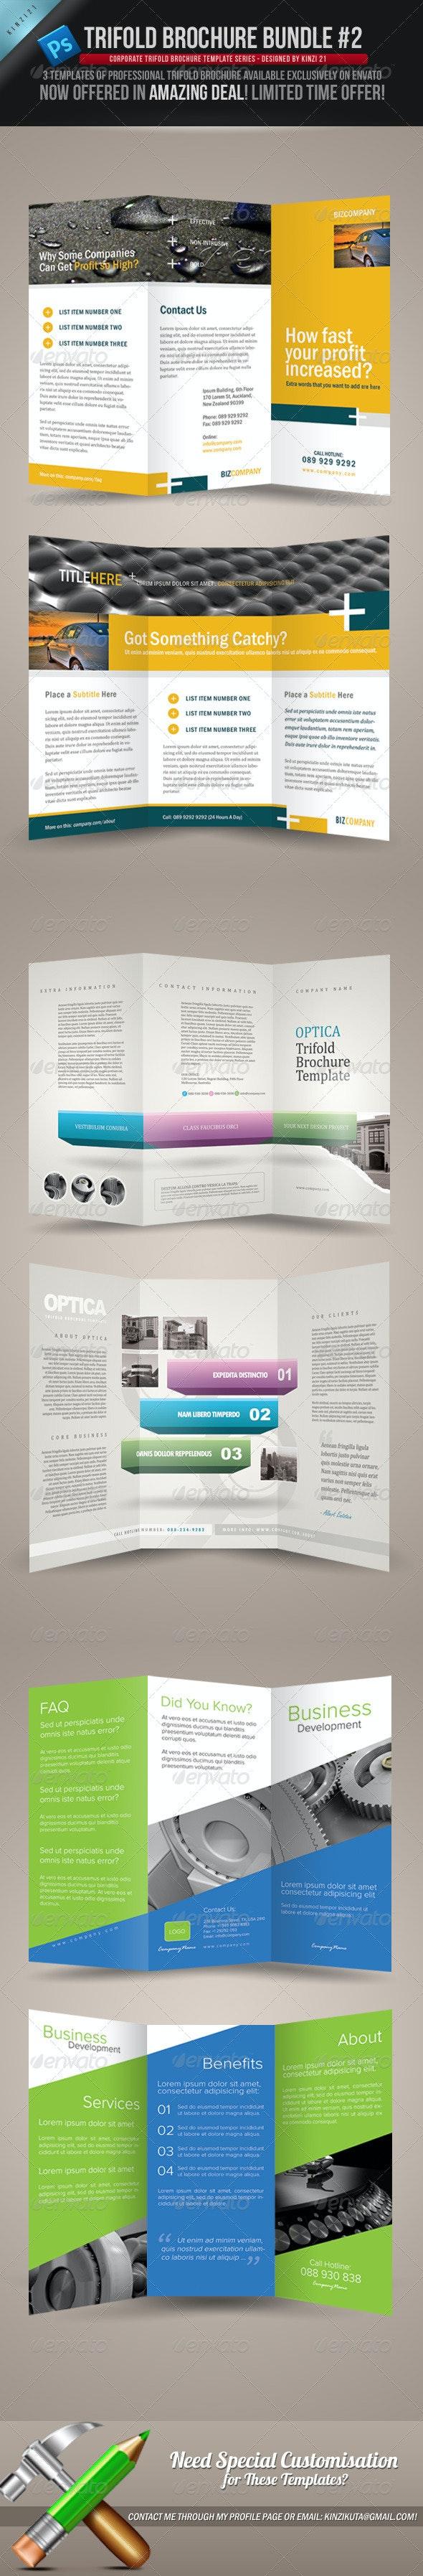 Trifold Brochure Bundle 02 - Corporate Brochures